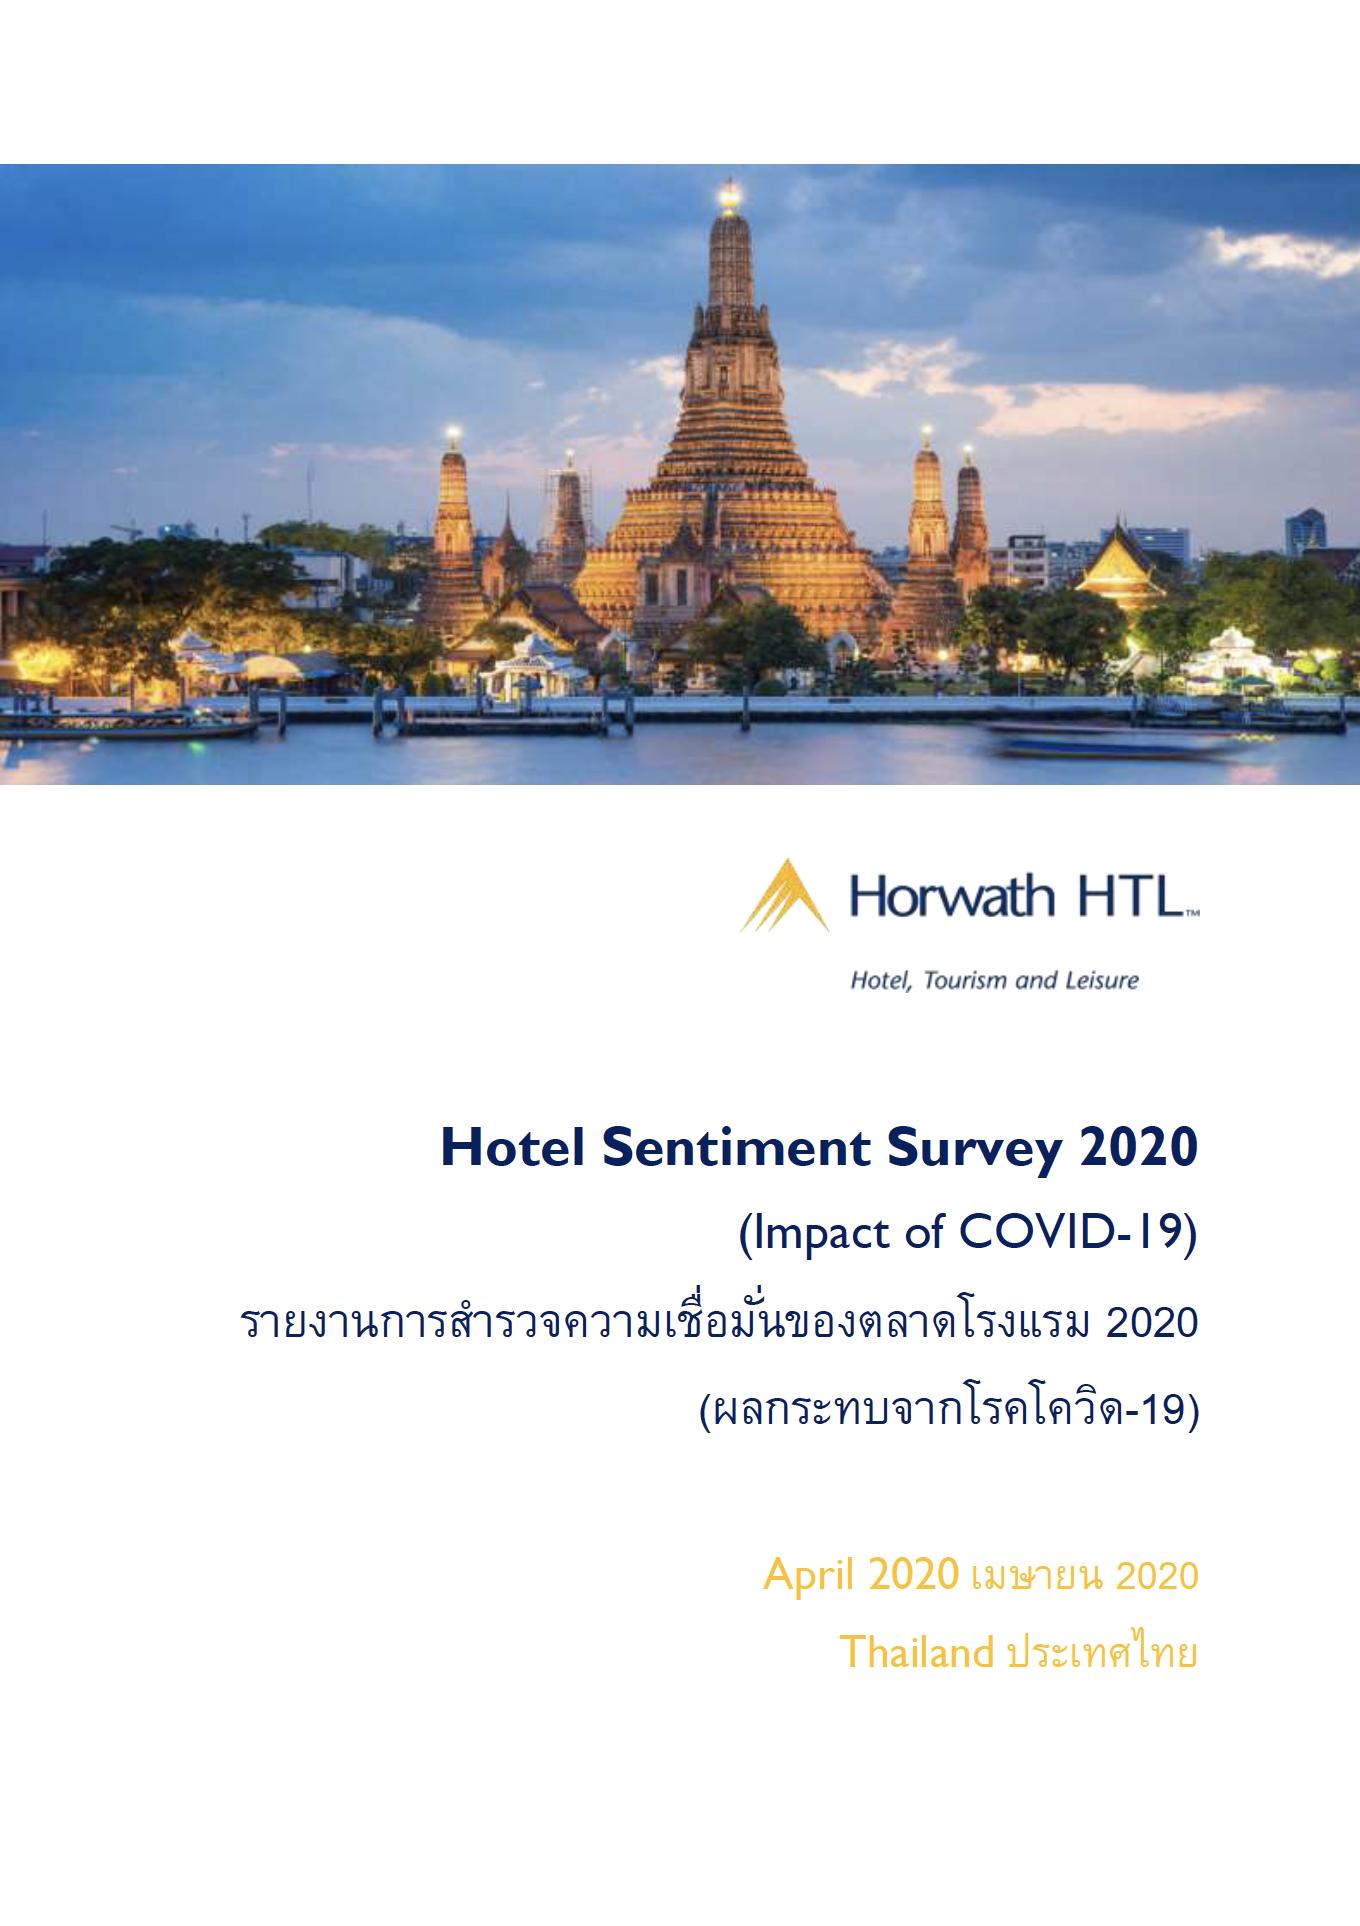 THAILAND Hotel Sentiment Survey